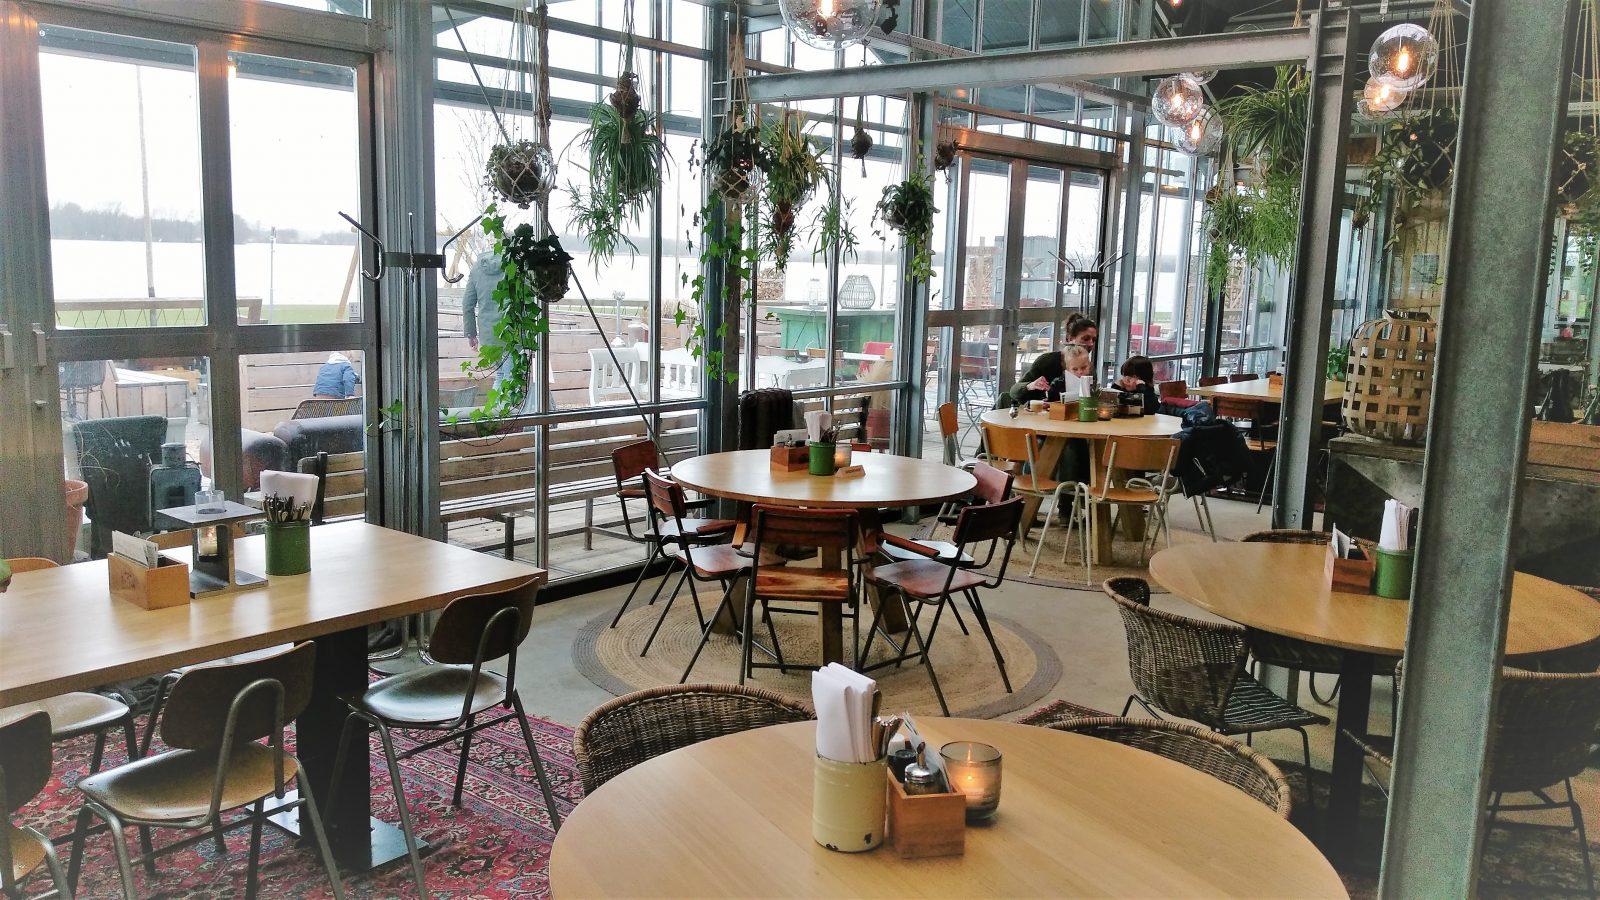 Brasserie Buitenhuis interieur